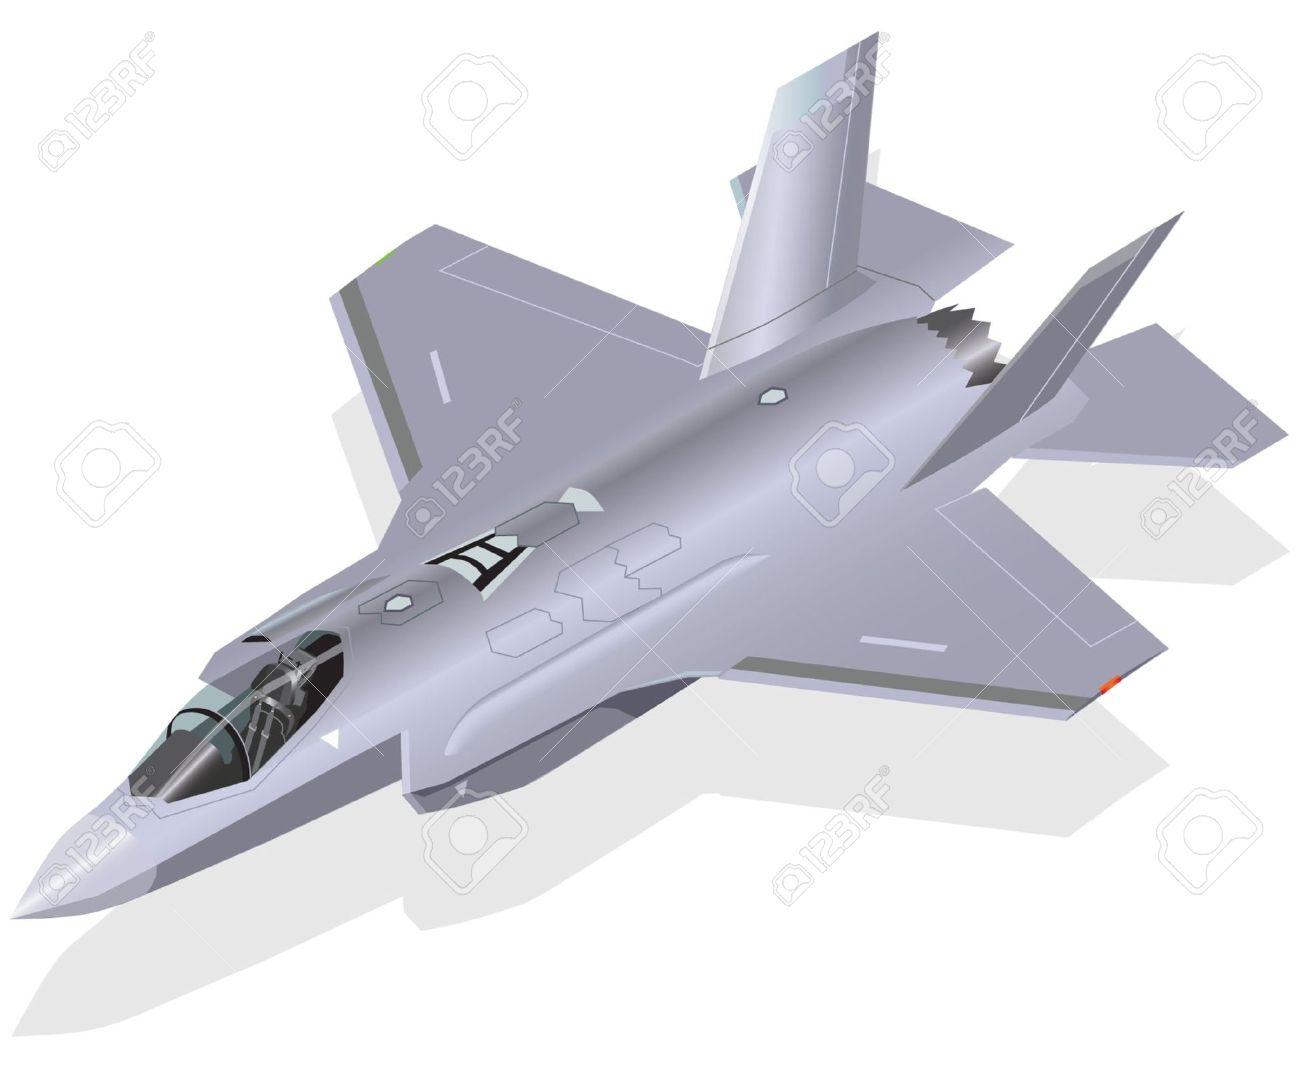 F 35 clipart.